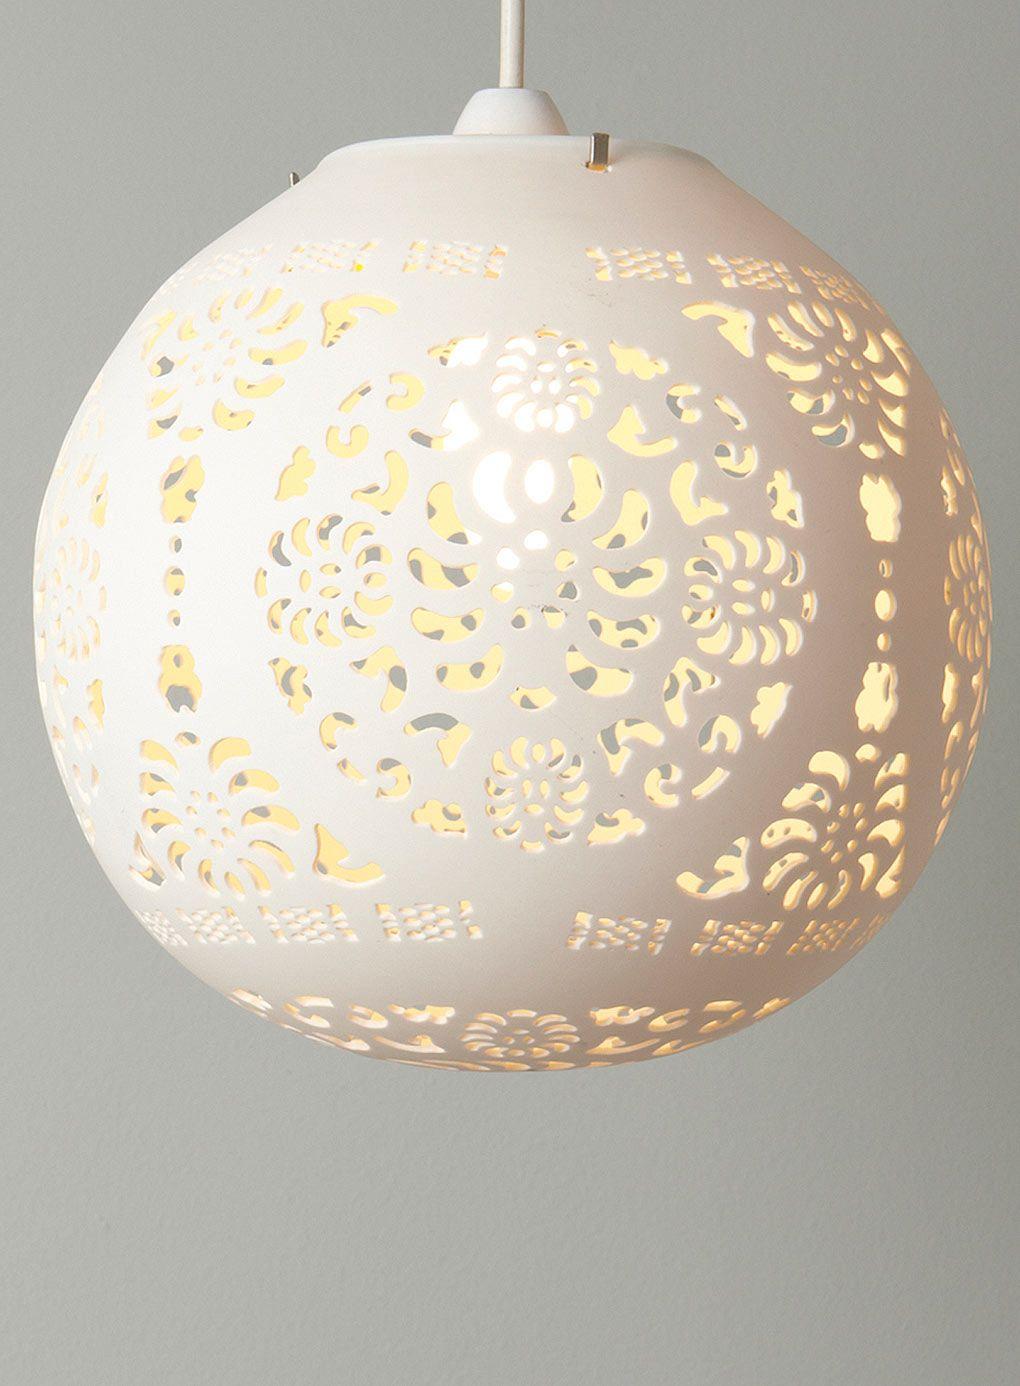 100 Best Corridors Stairs Lighting Images By John: Alida Ball Easyfit Ceiling Light